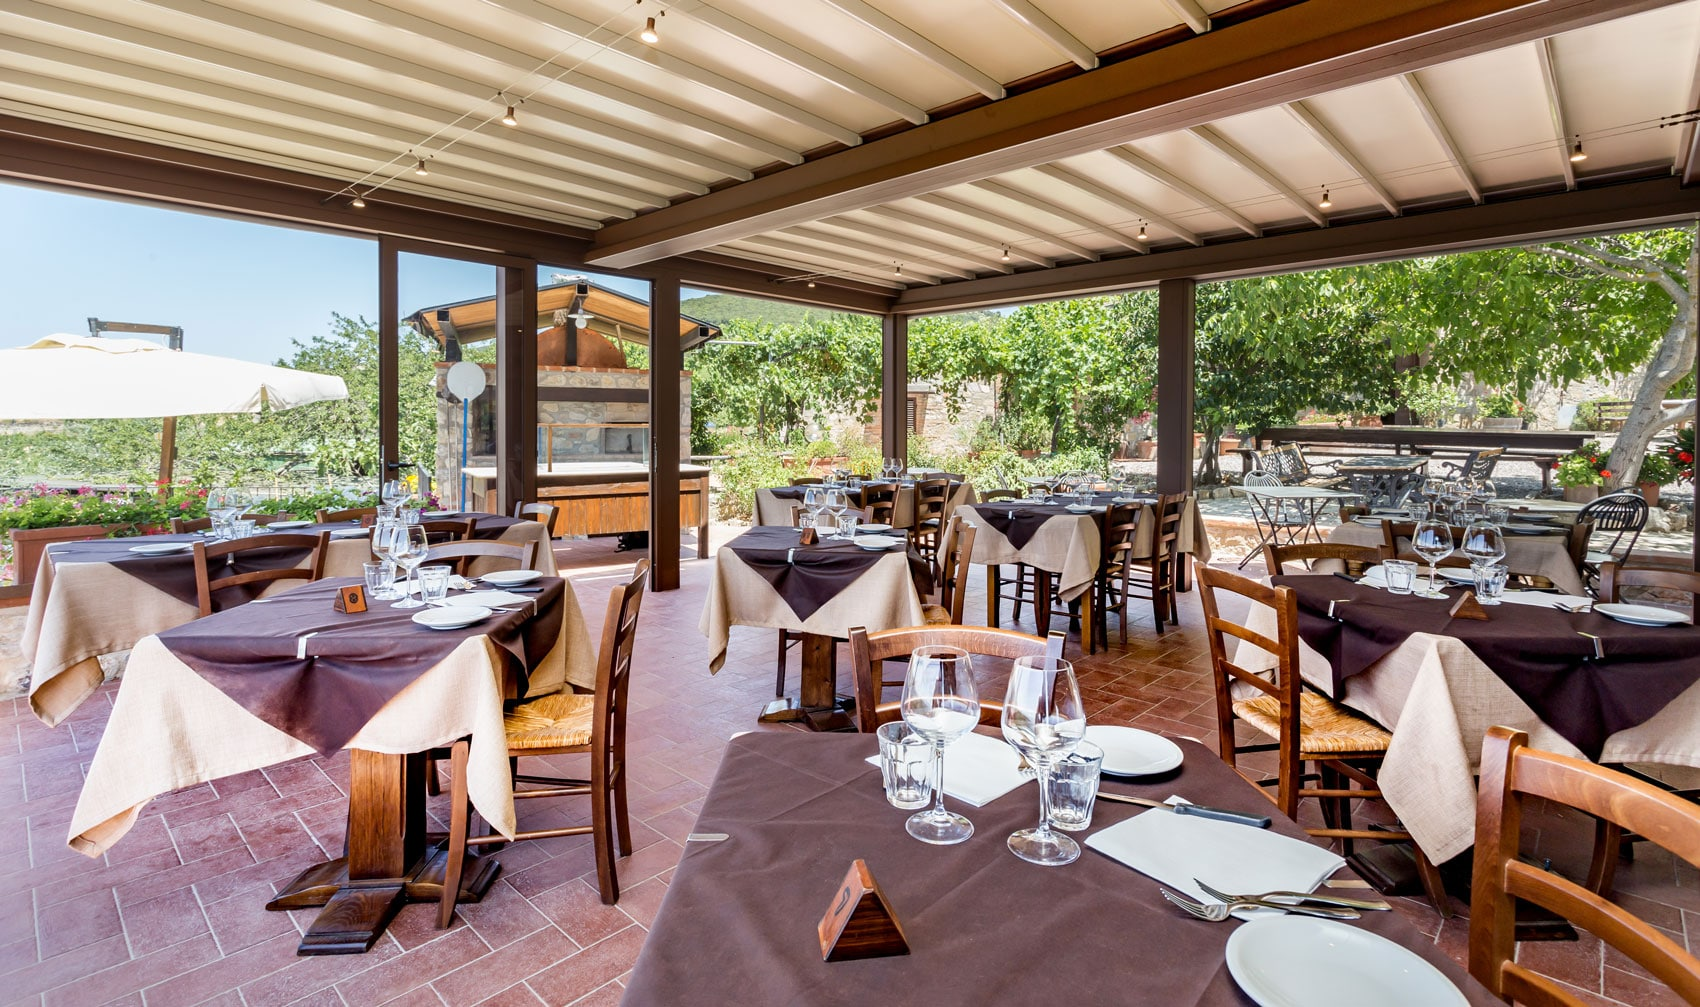 The Tuscan cuisine Restaurant